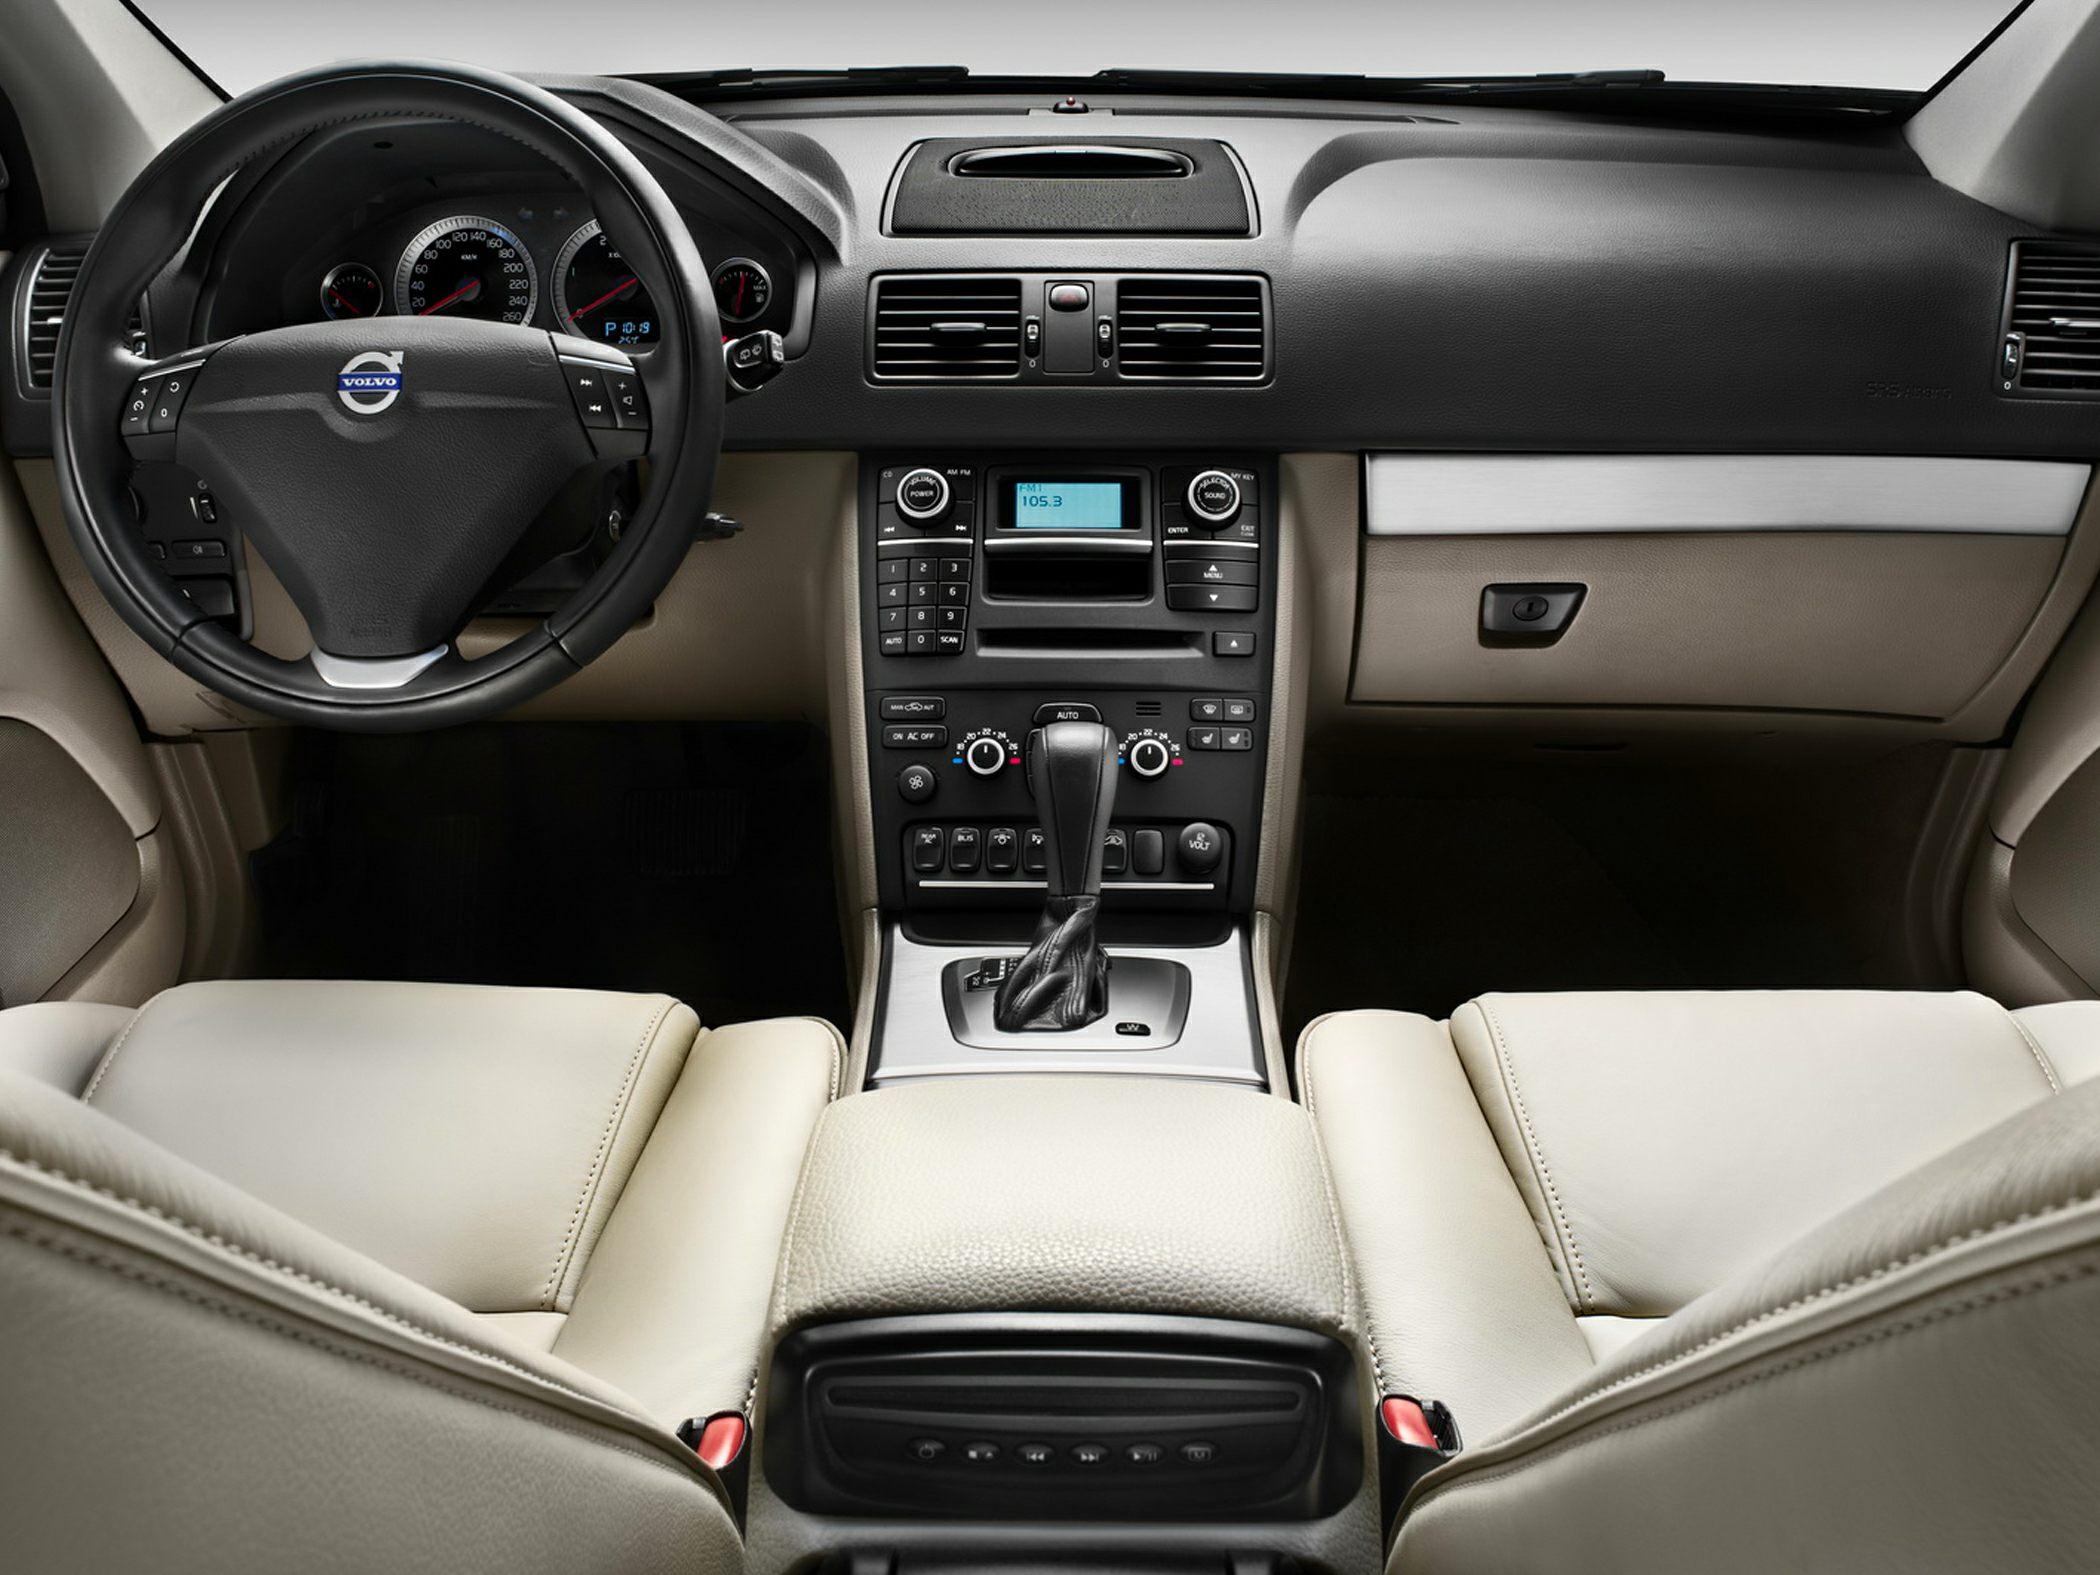 2014 Volvo XC90 Glamour Interior